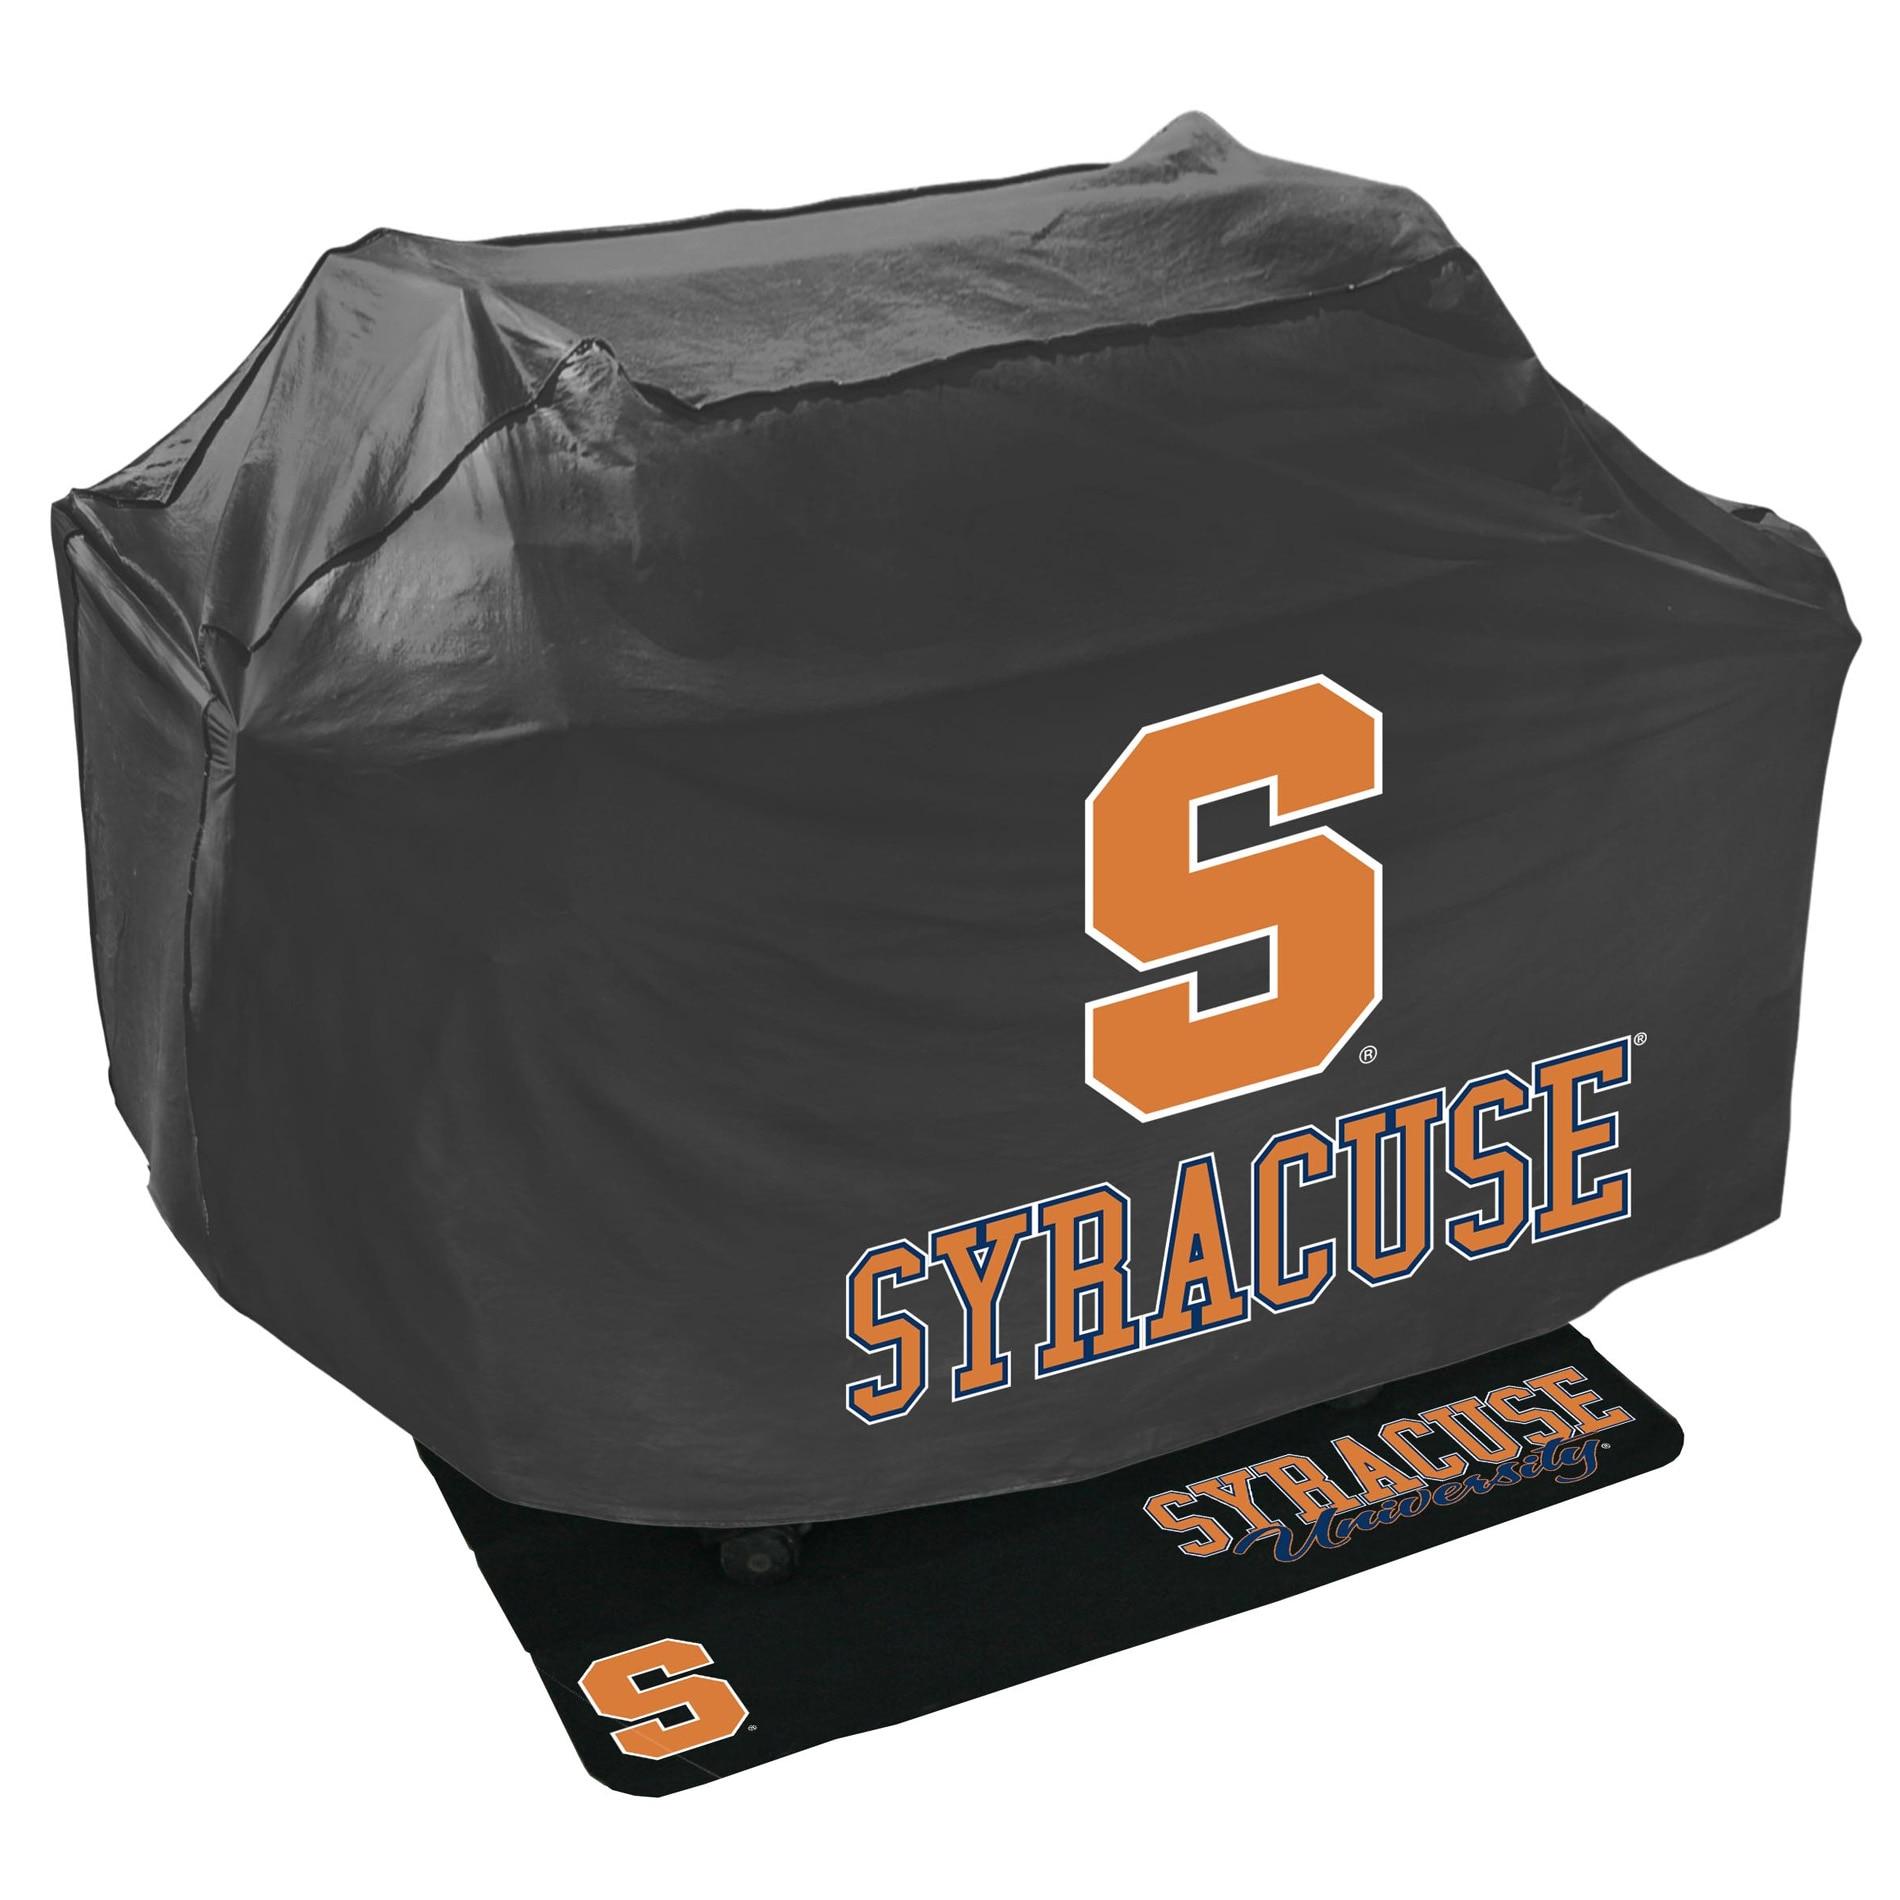 Syracuse Orangemen Grill Cover and Mat Set